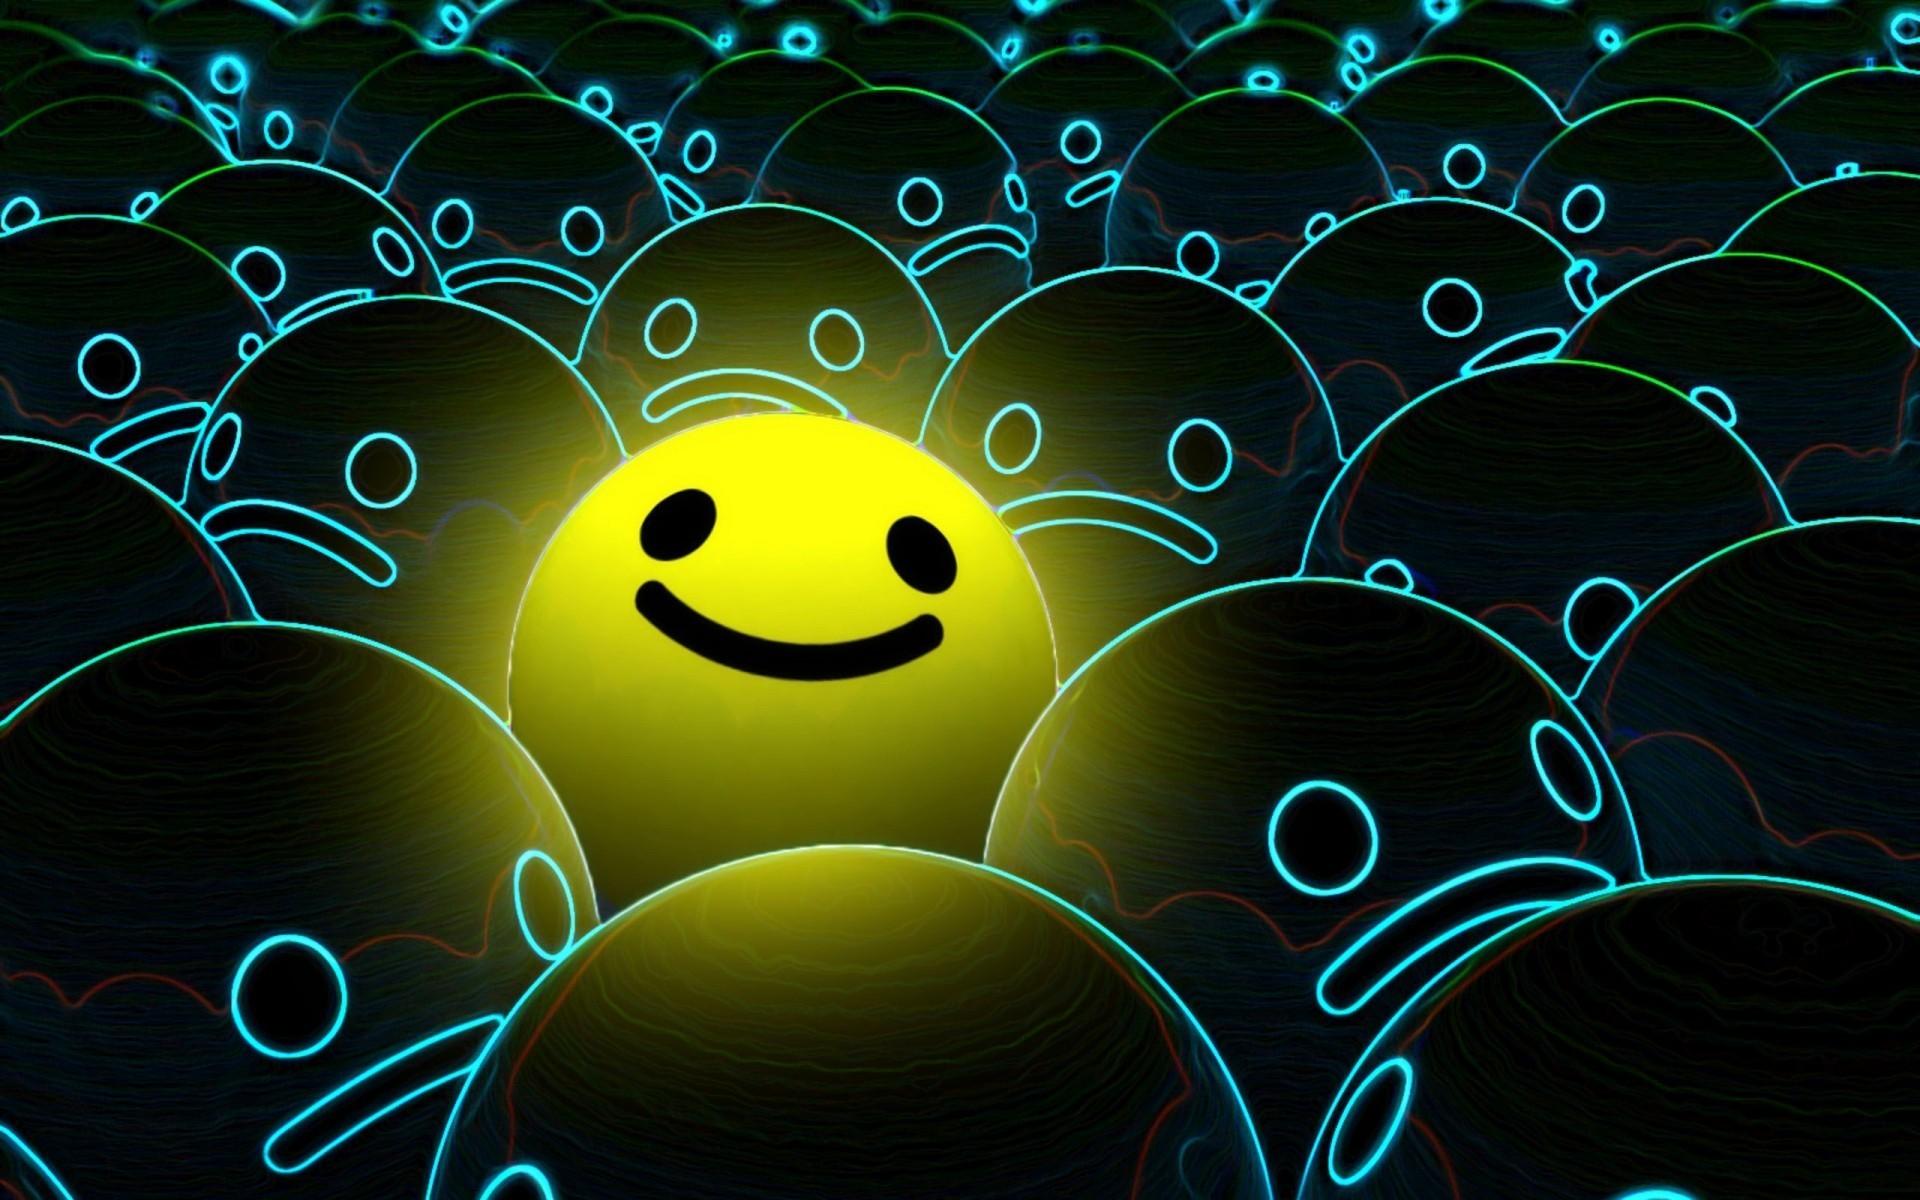 Smiley face desktop wallpaper 49025 1920x1200 px hdwallsource smiley face desktop wallpaper 49025 voltagebd Gallery